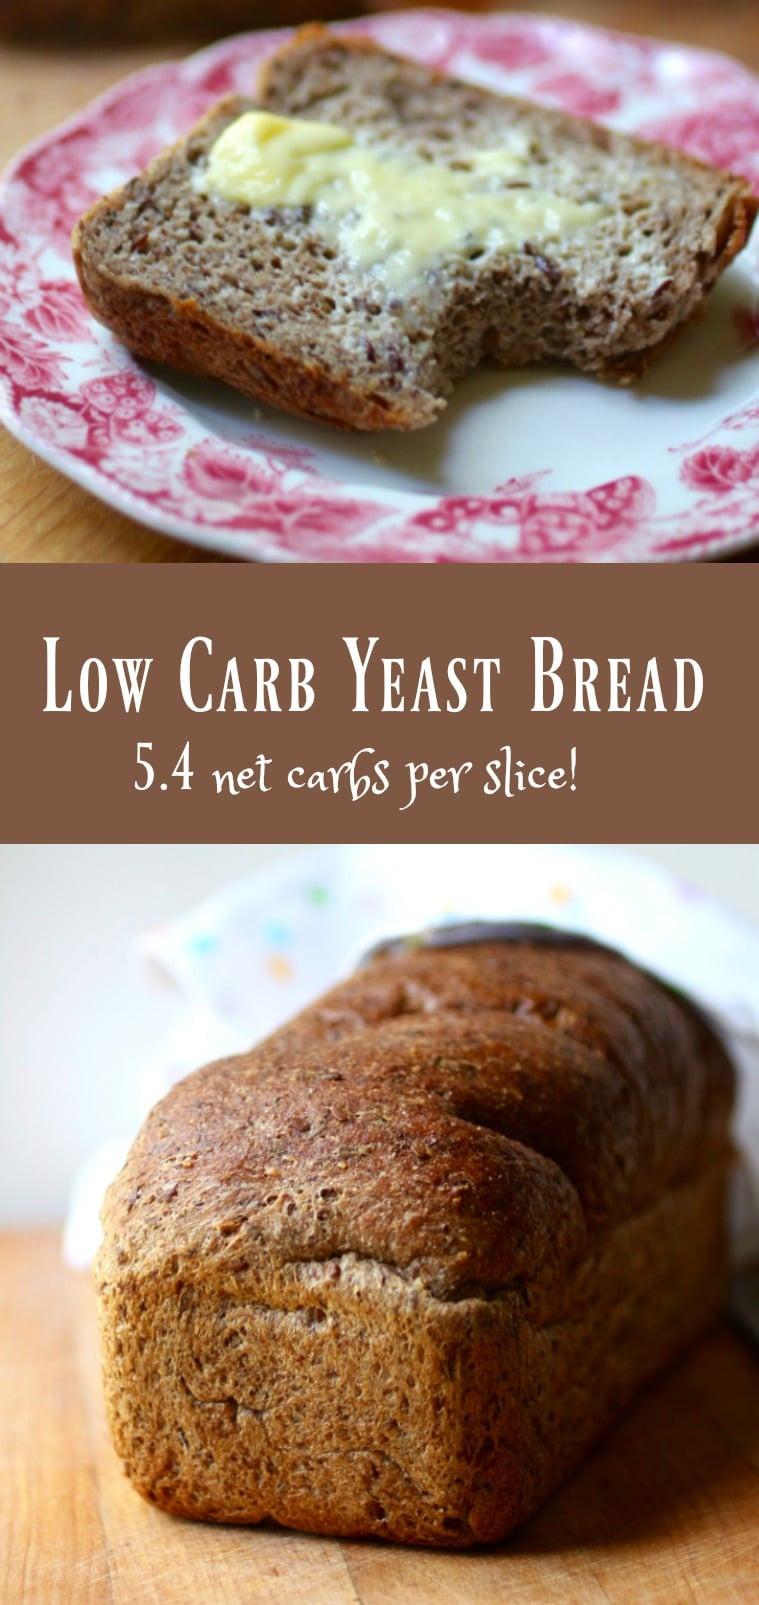 High Fiber Bread Machine Recipe  Low Carb Yeast Bread Keto Sandwich Bread lowcarb ology